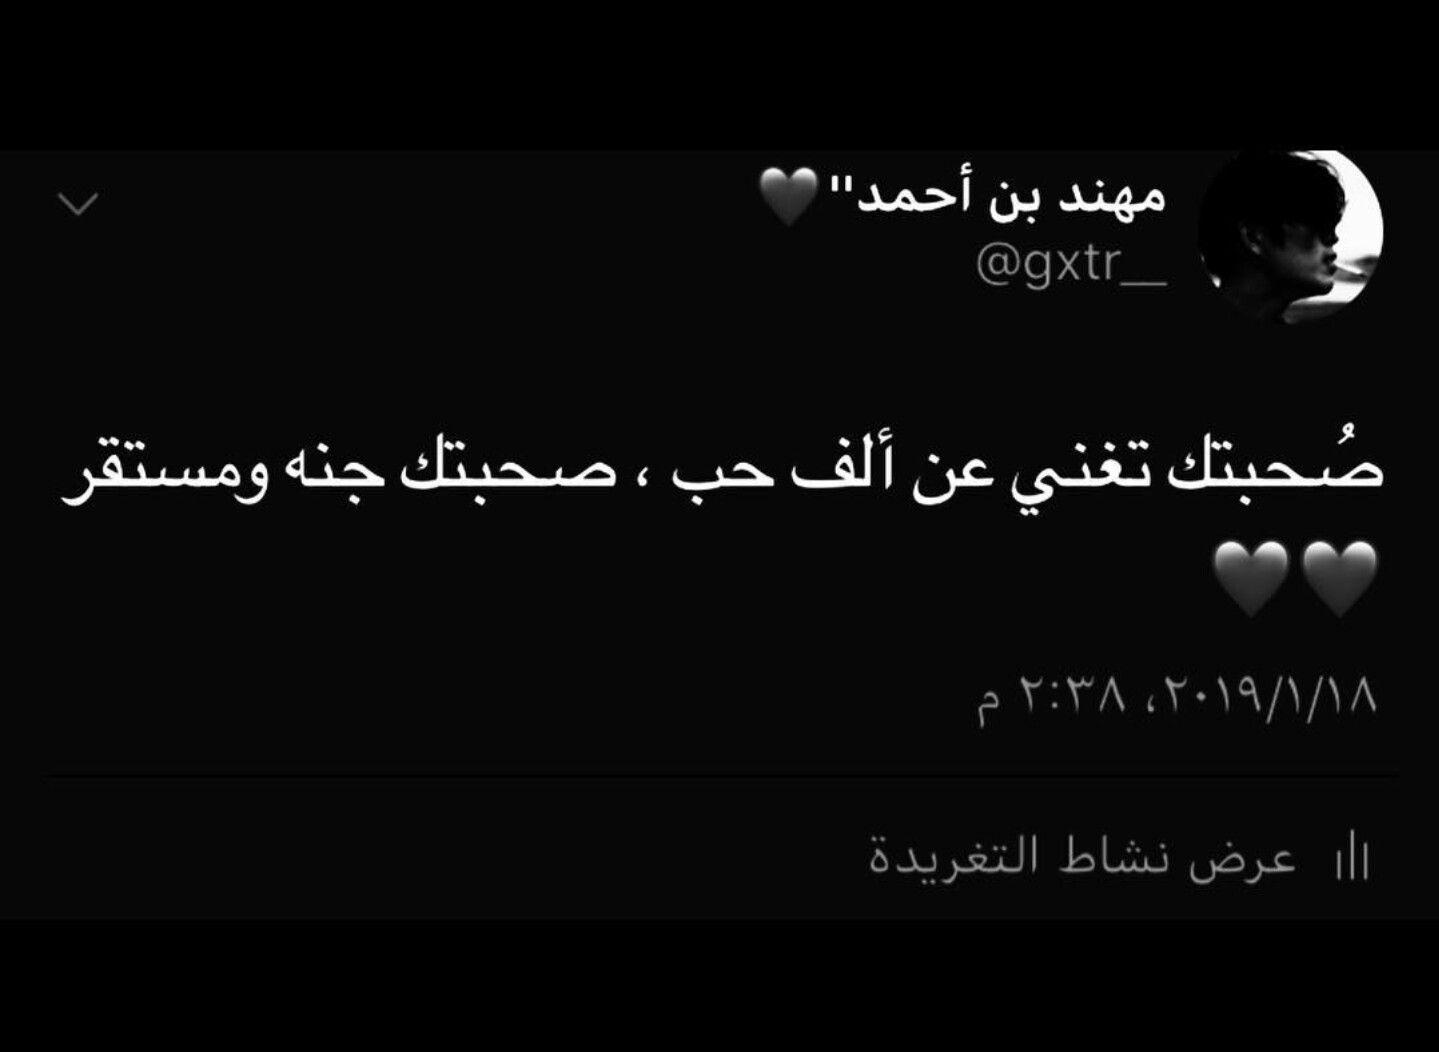 Pin By La Reina Aya On تغريدة سوداء Black Tweet Best Friend Quotes Friends Quotes Short Quotes Love